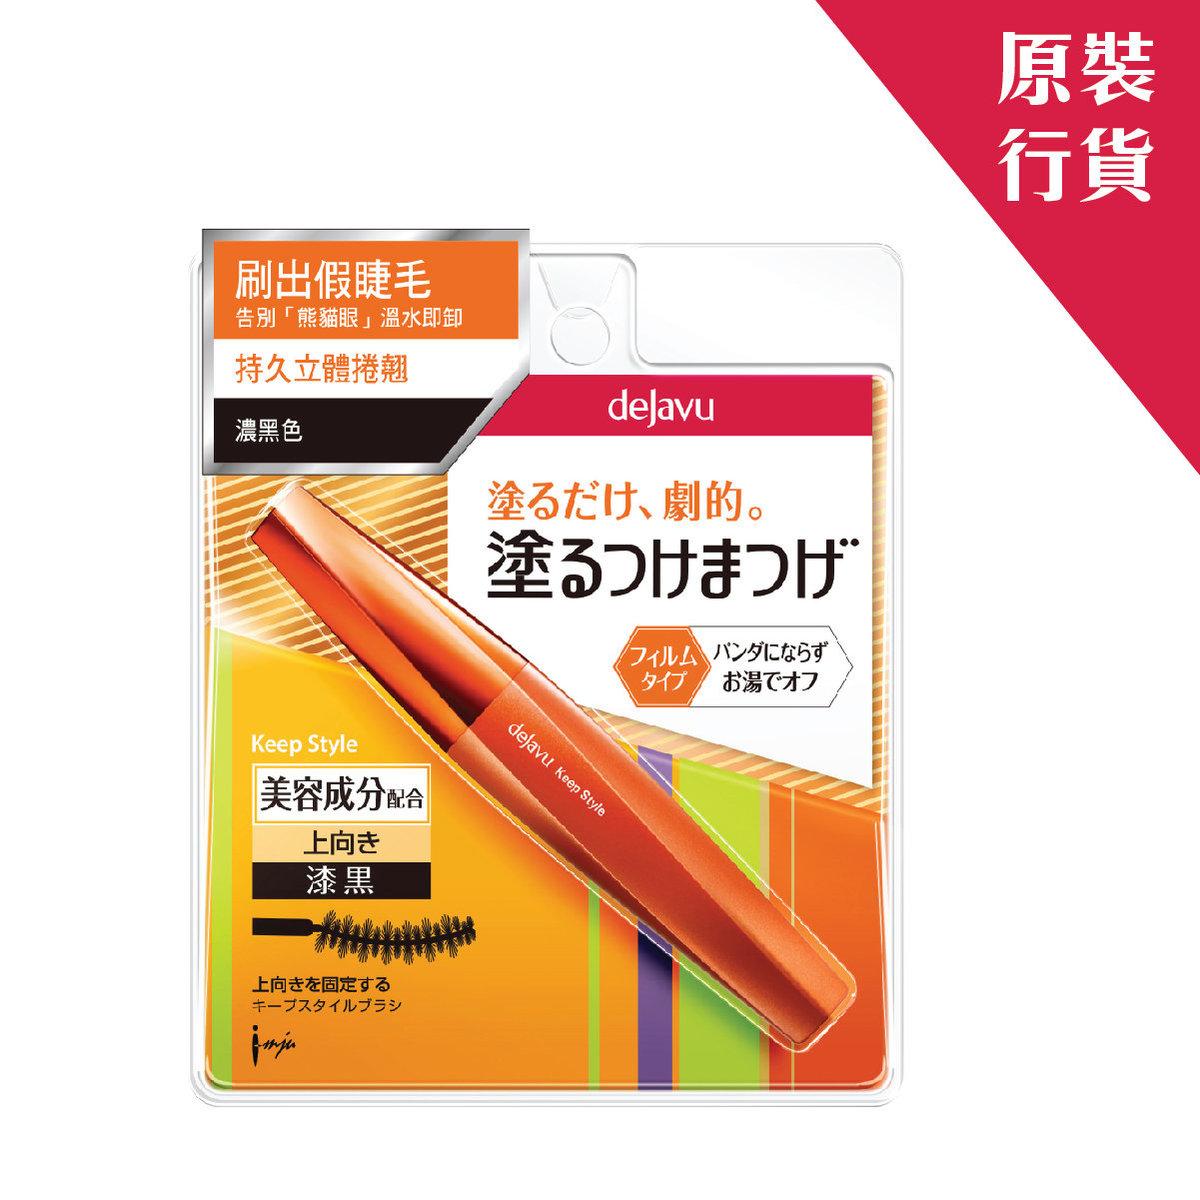 [Authorized Goods] Made in Japan- Keep Style Mascara, Black